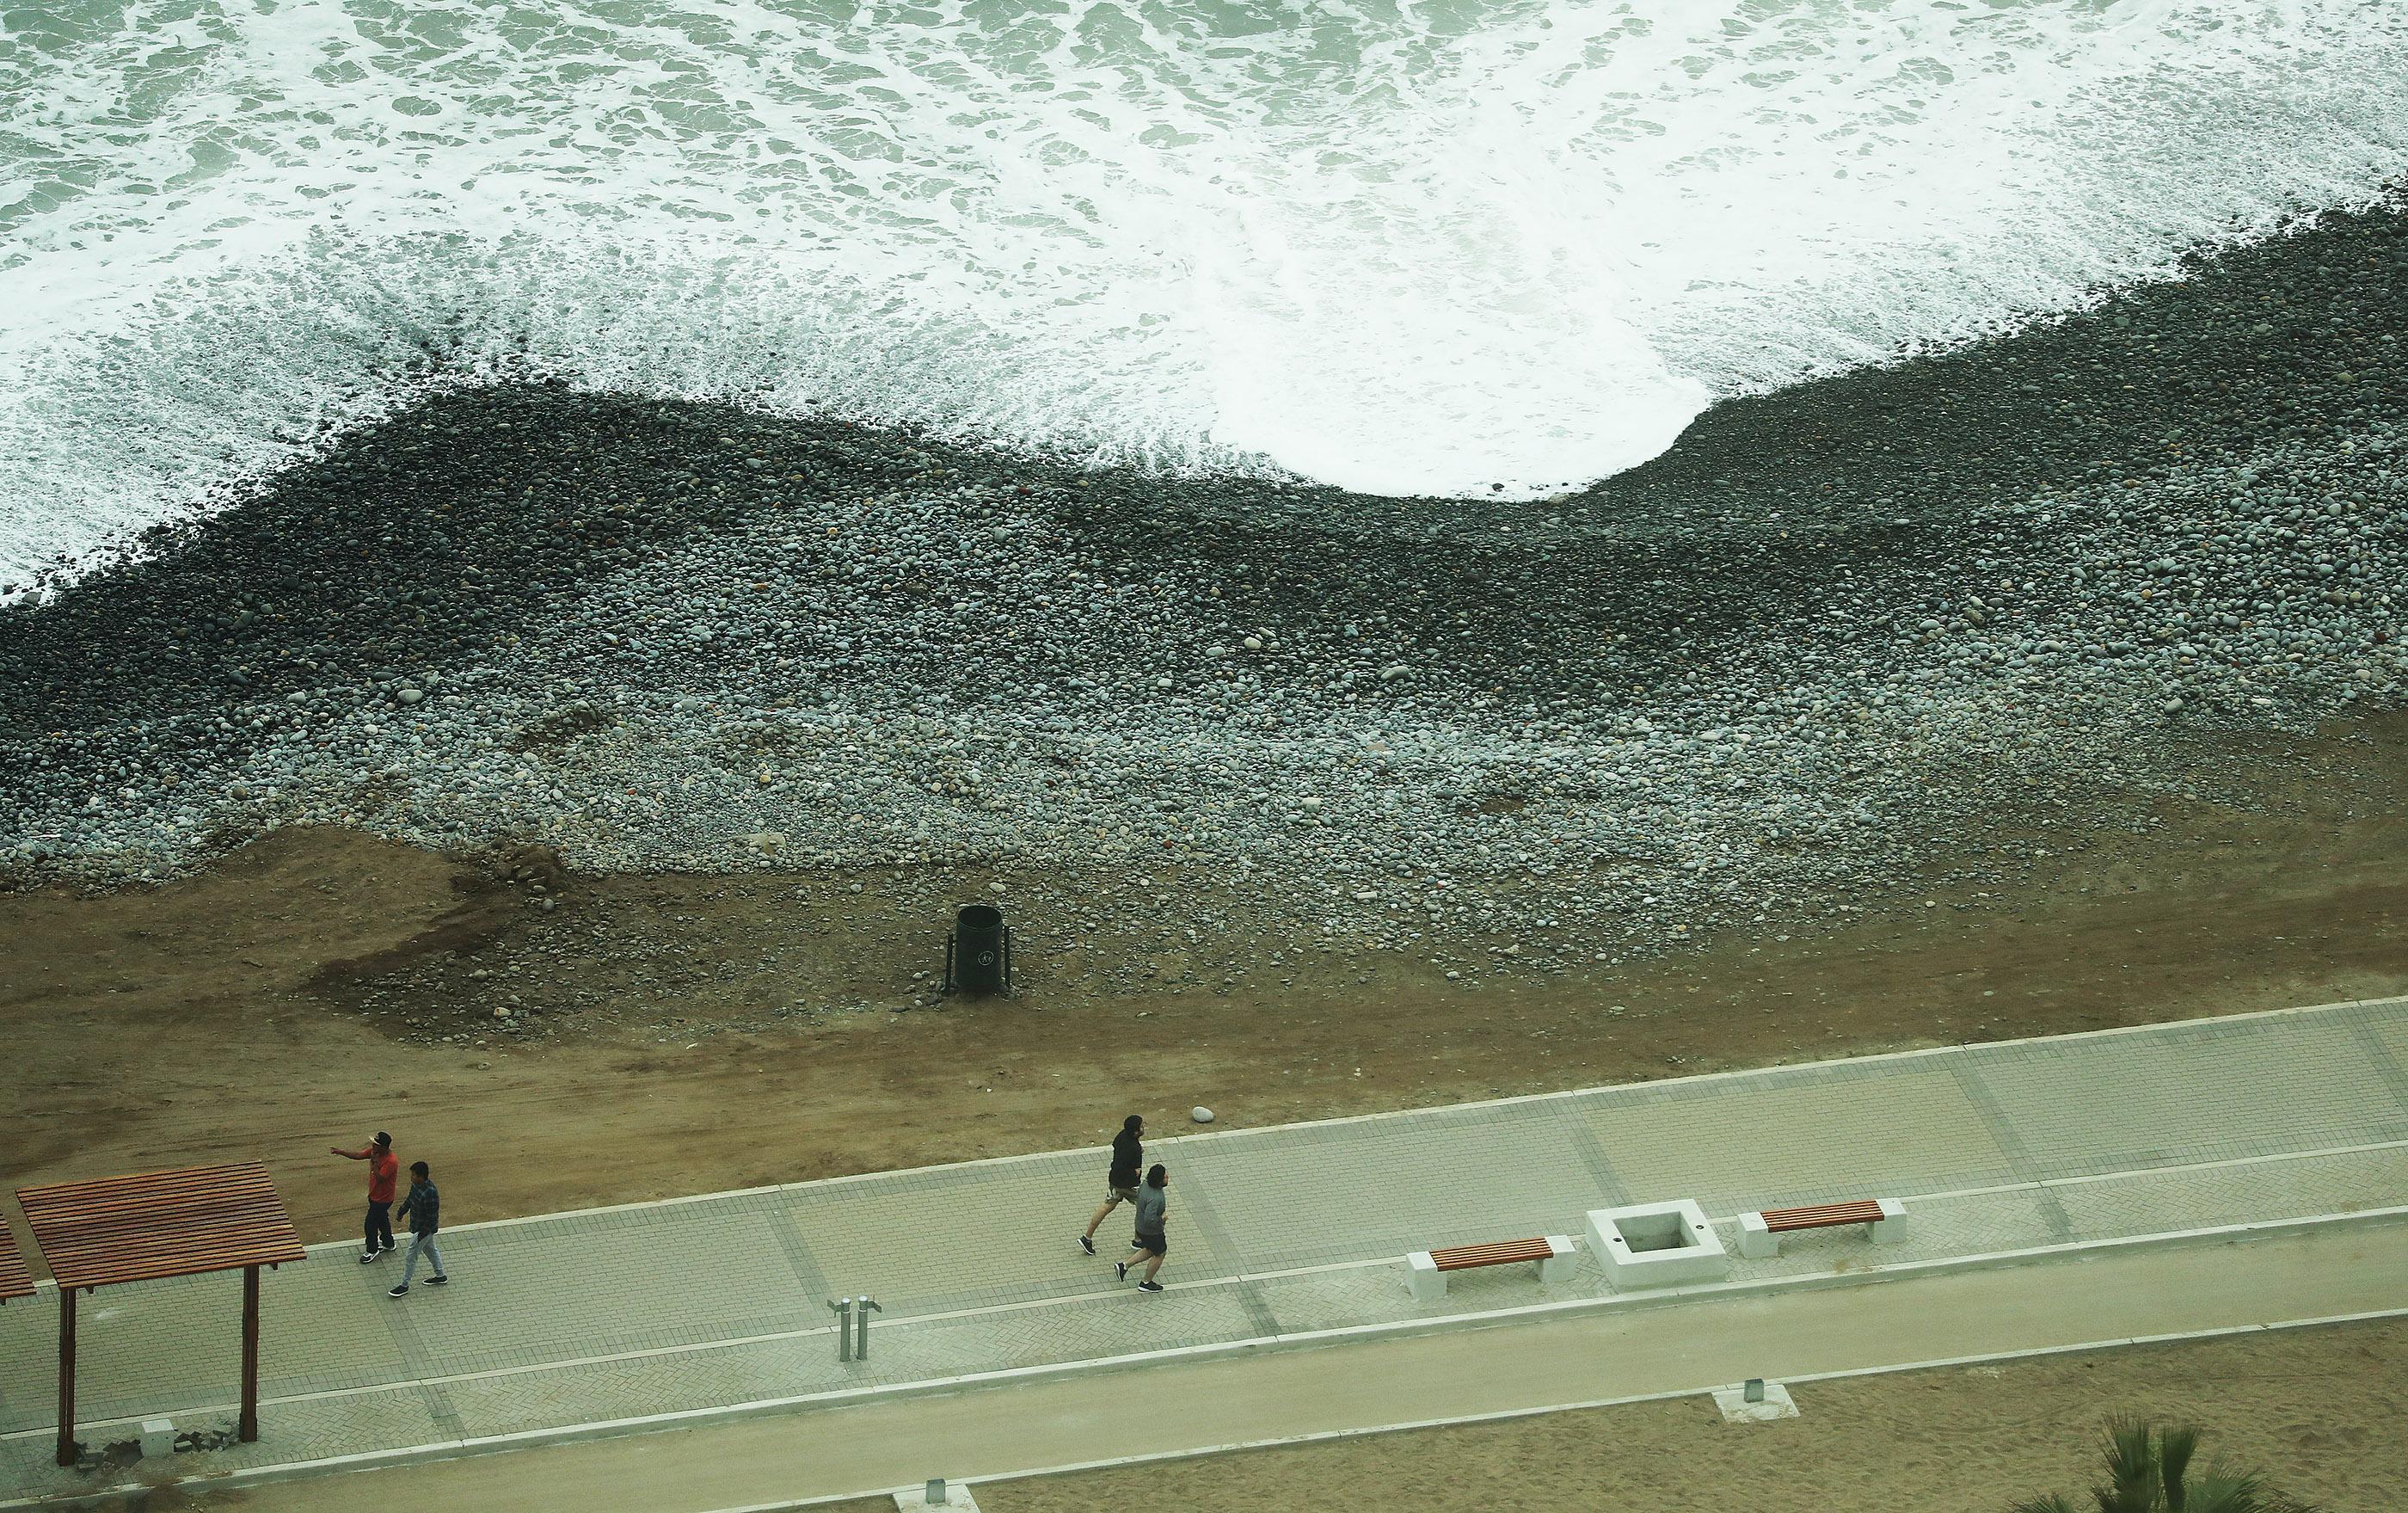 People walk near Redondo Beach in Lima, Peru, on Oct. 20, 2018.